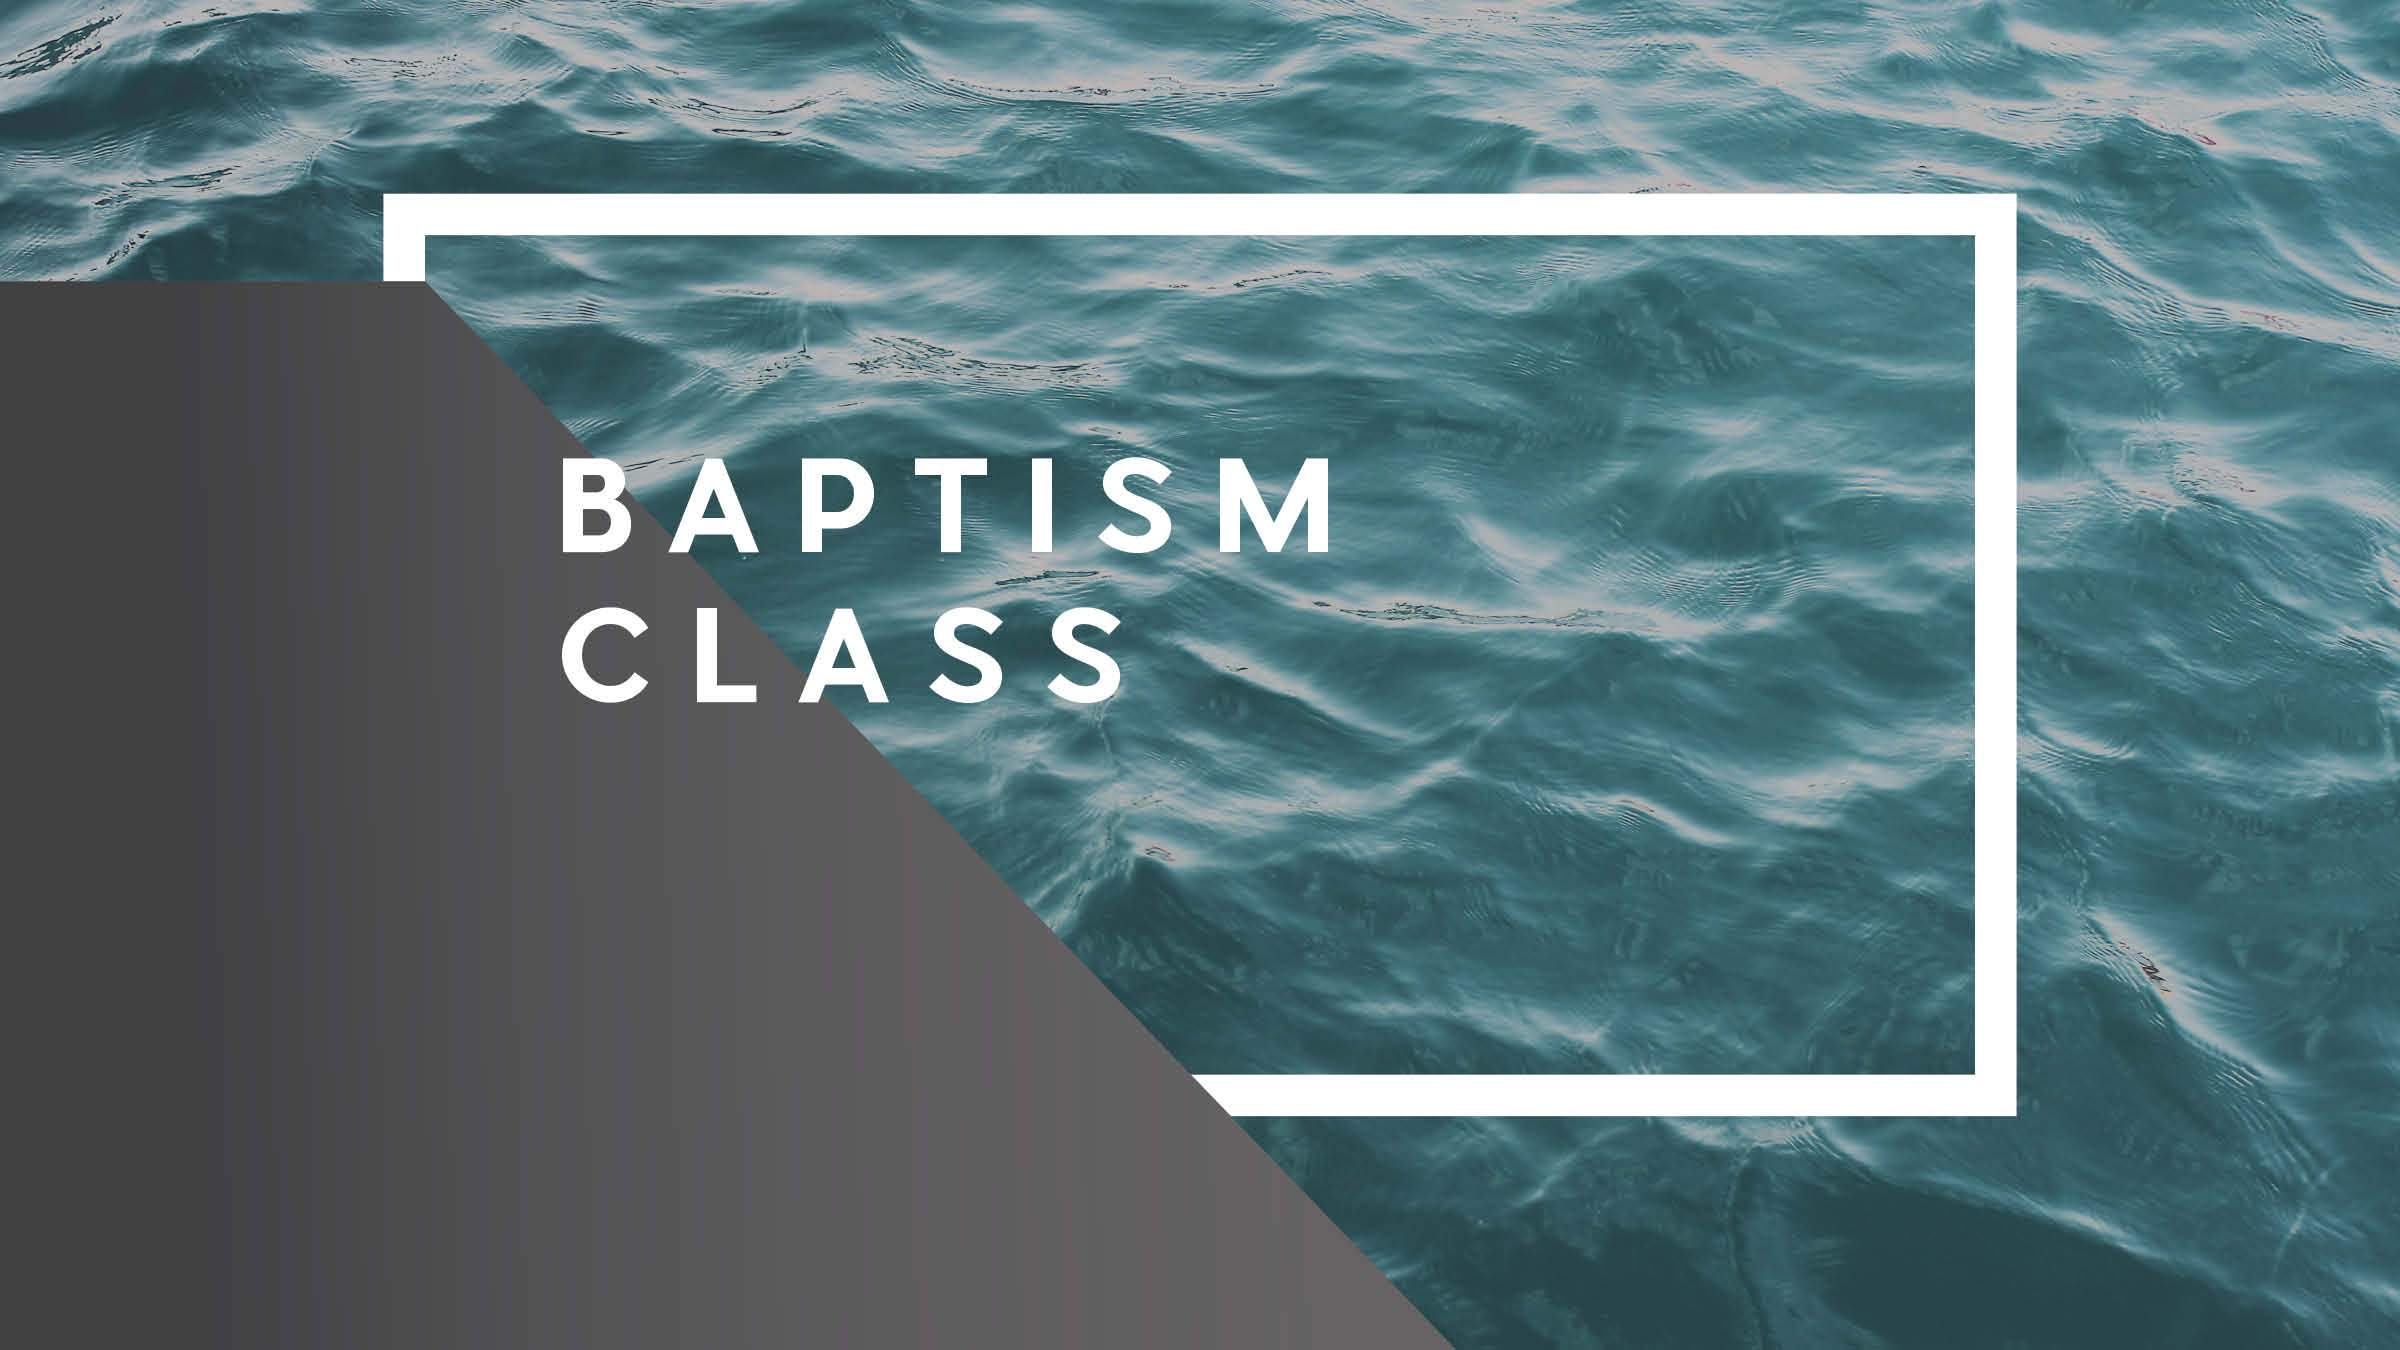 Event baptism class